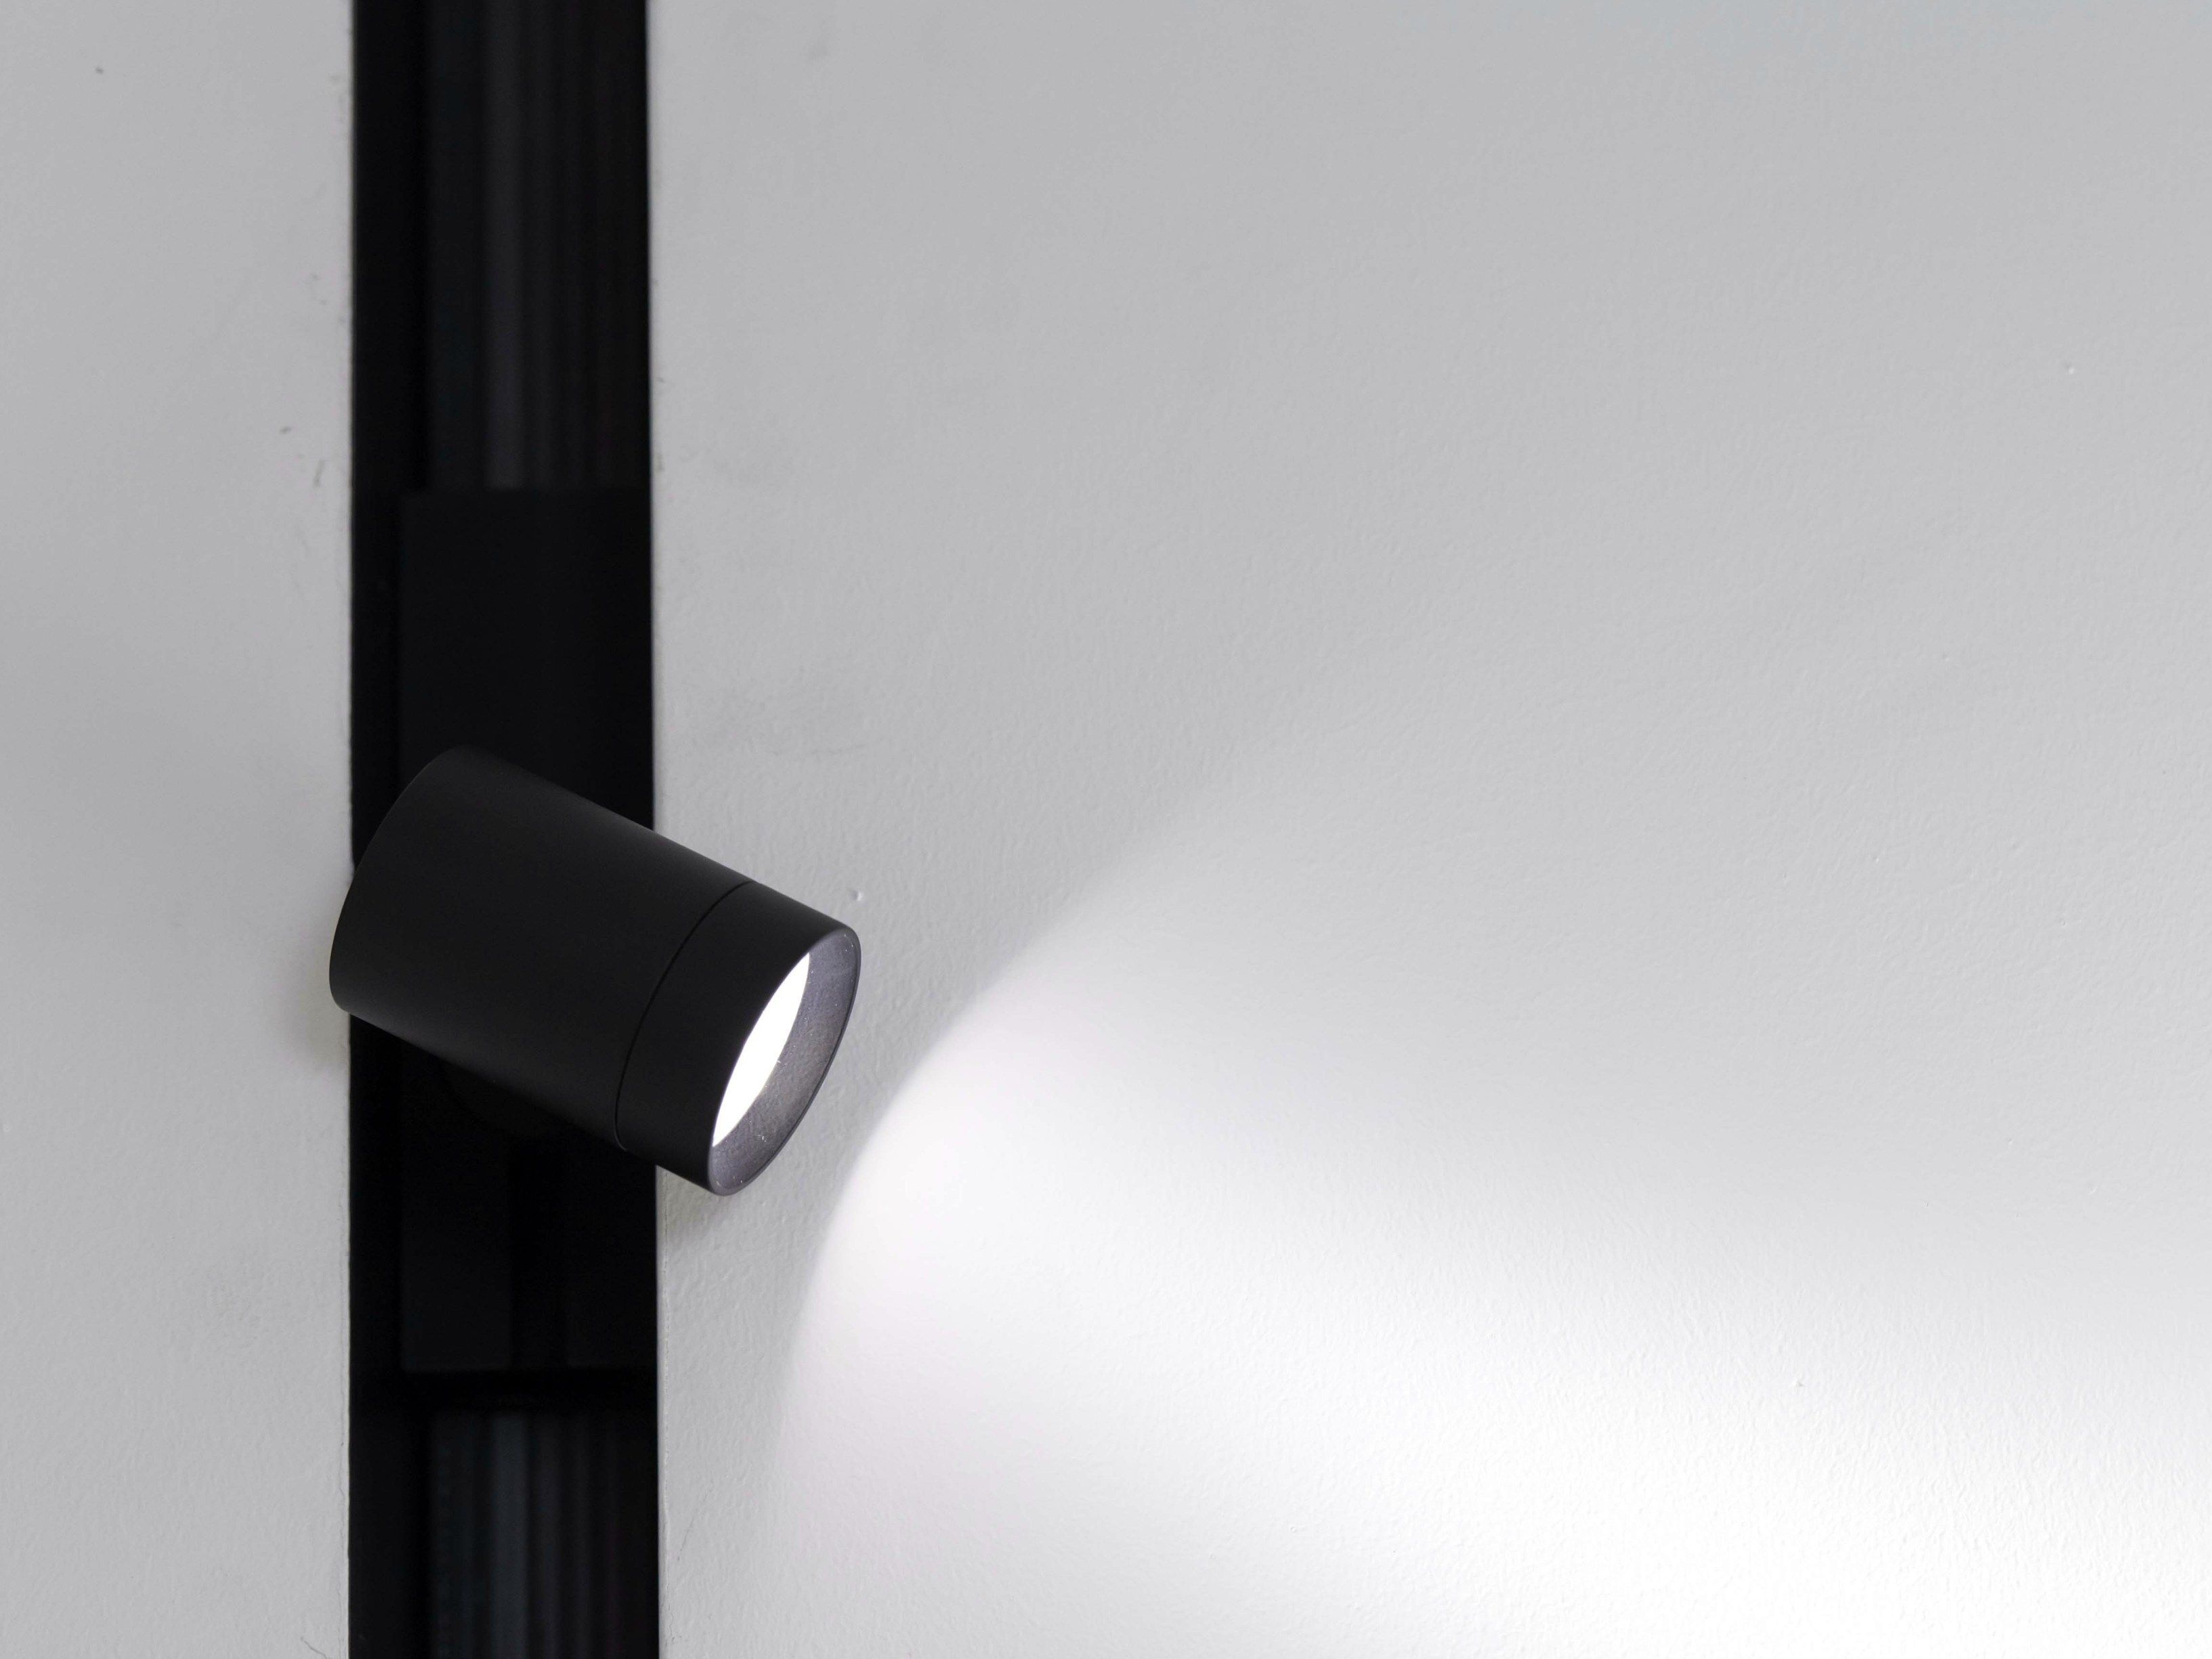 Einbau lineares led system the running magnet kollektion led spotlight the running magnet spot by flos parisarafo Gallery